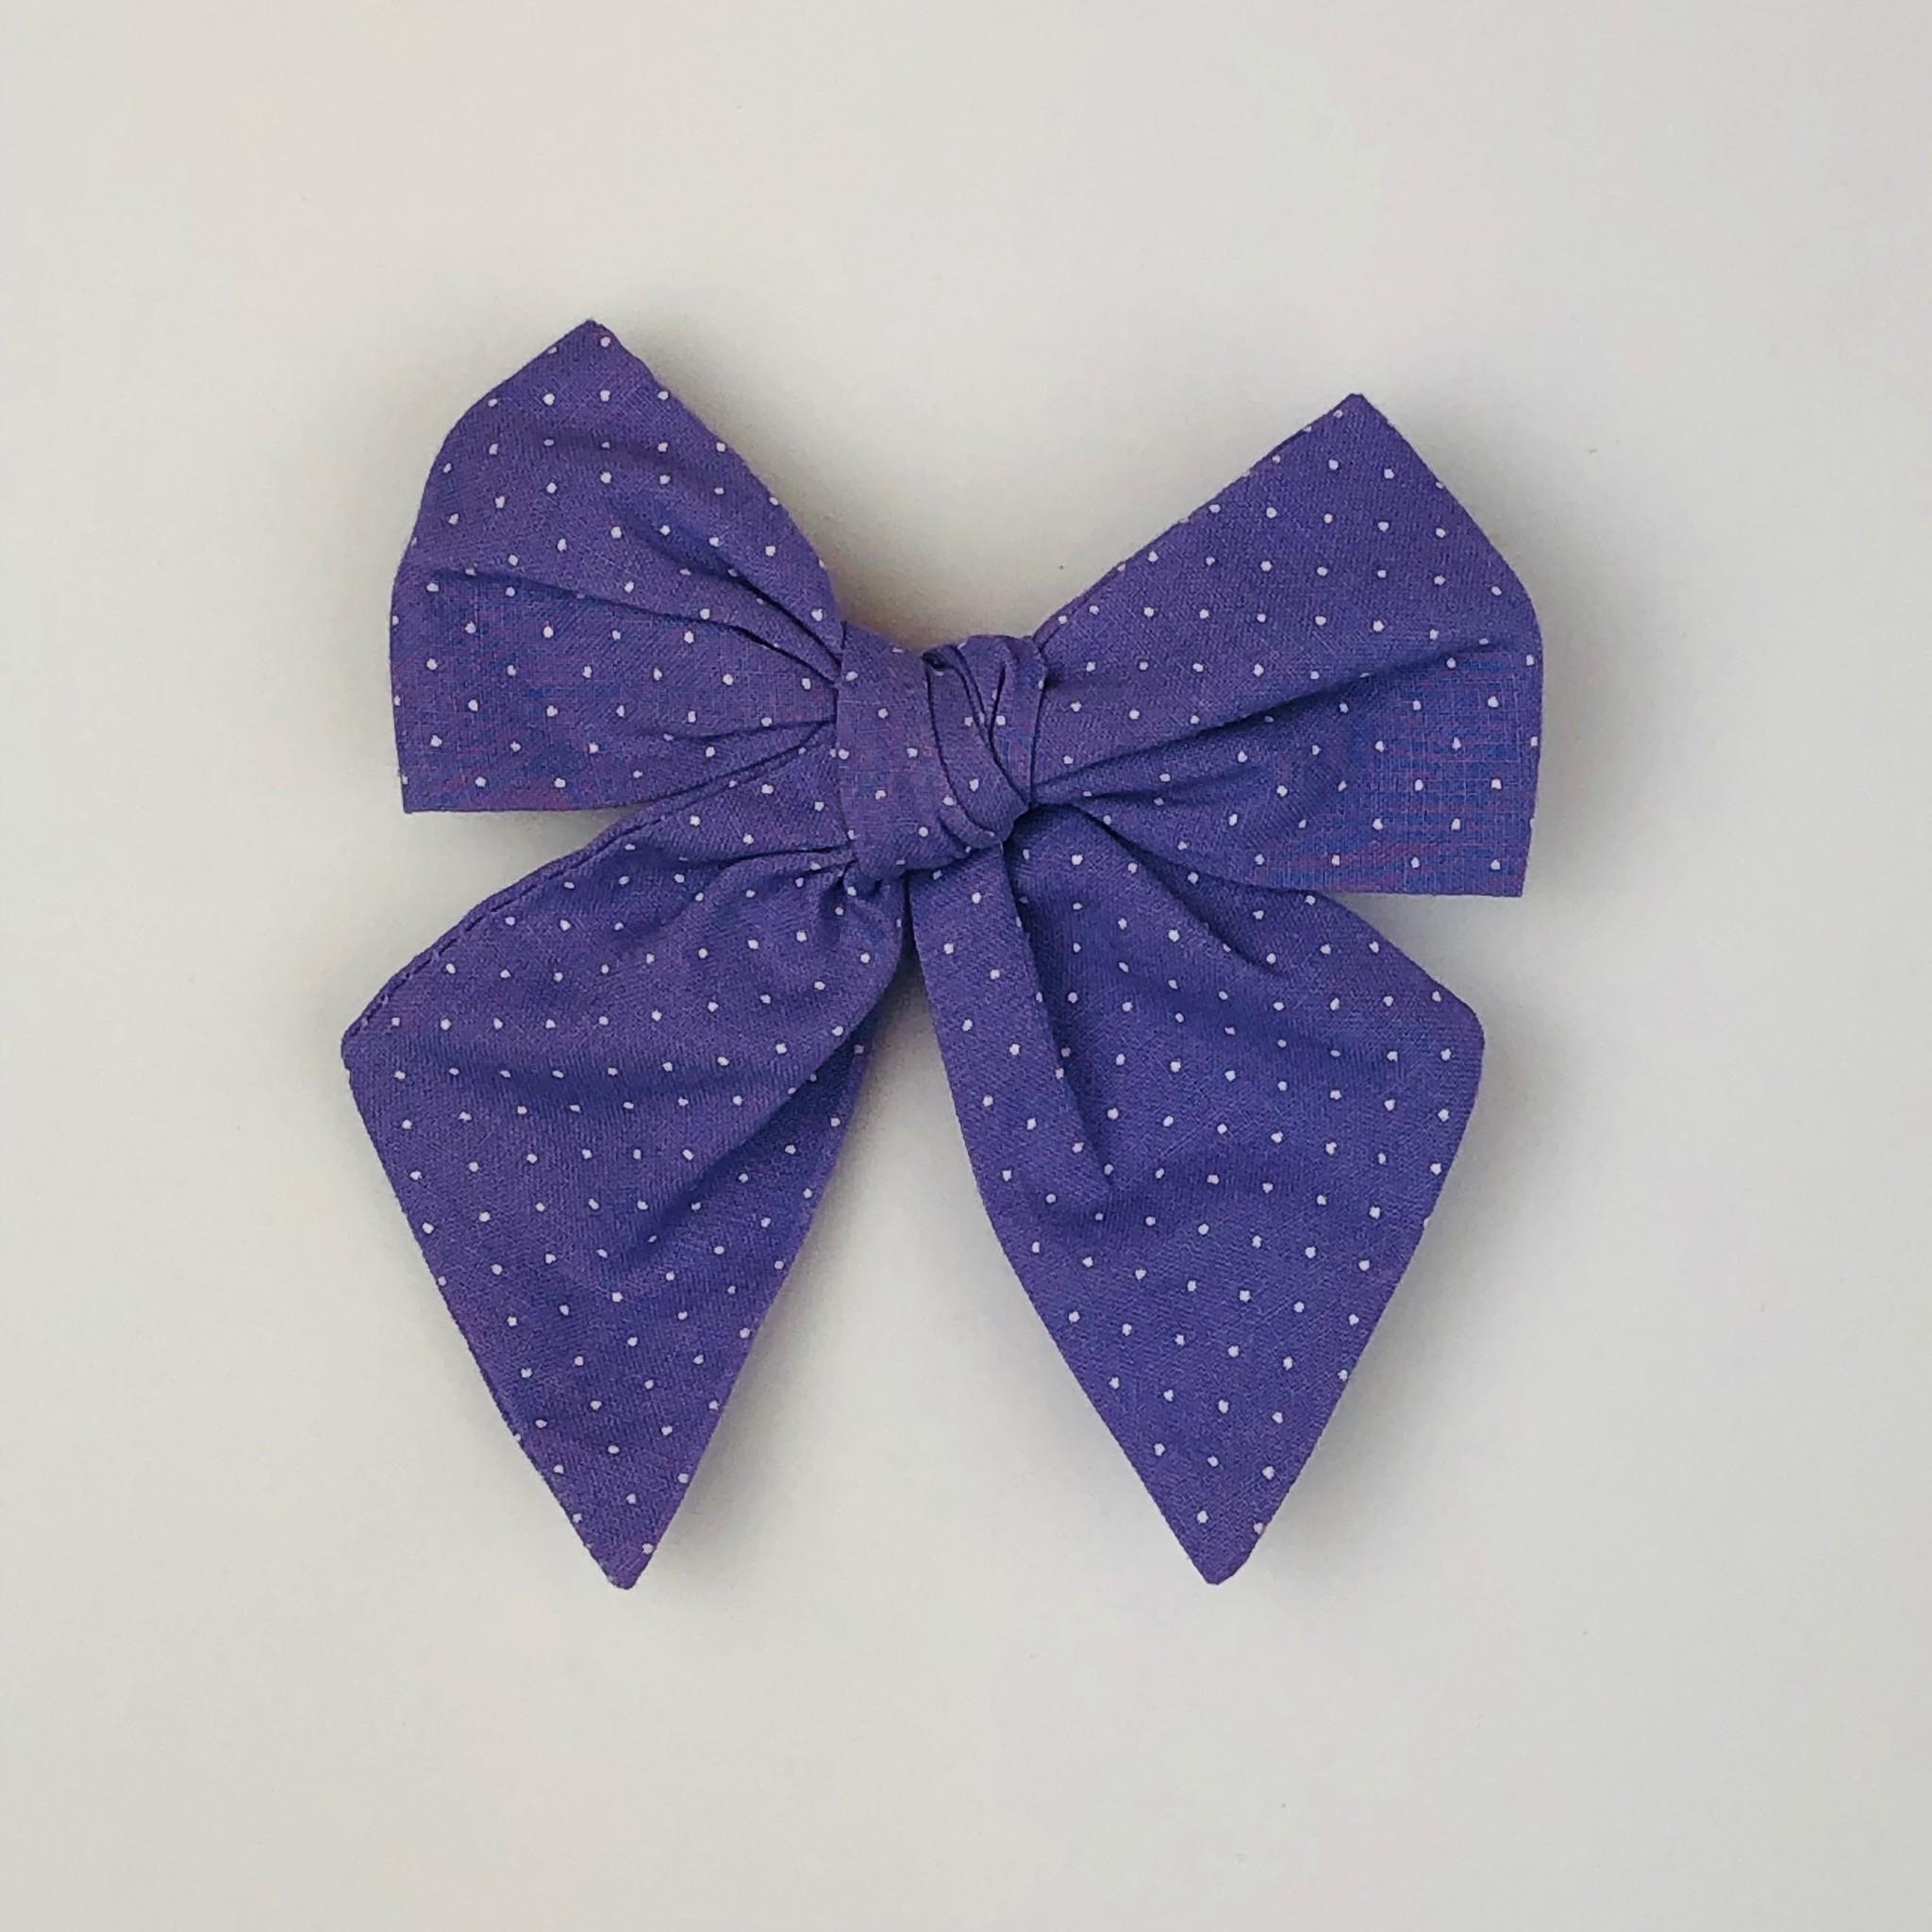 Nola Tawk White Dots on Purple Sailor Bow